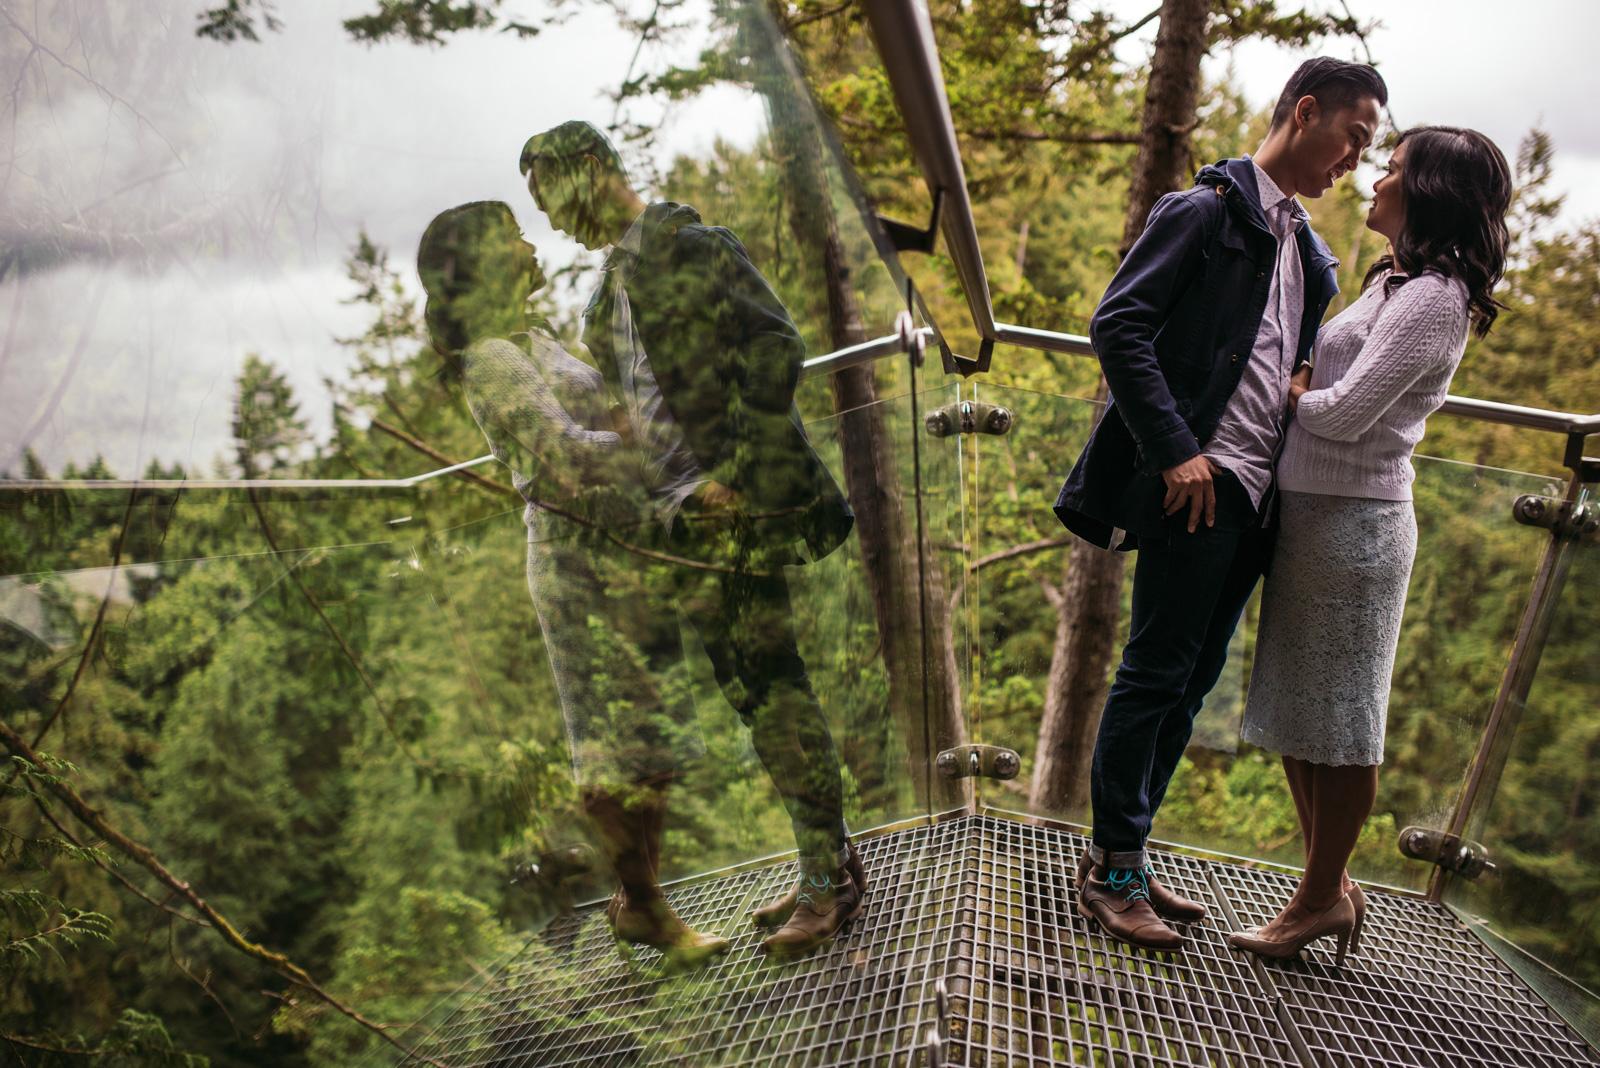 vancouver-island-wedding-photographers-capilano-suspension-bridge-engagement-4.jpg